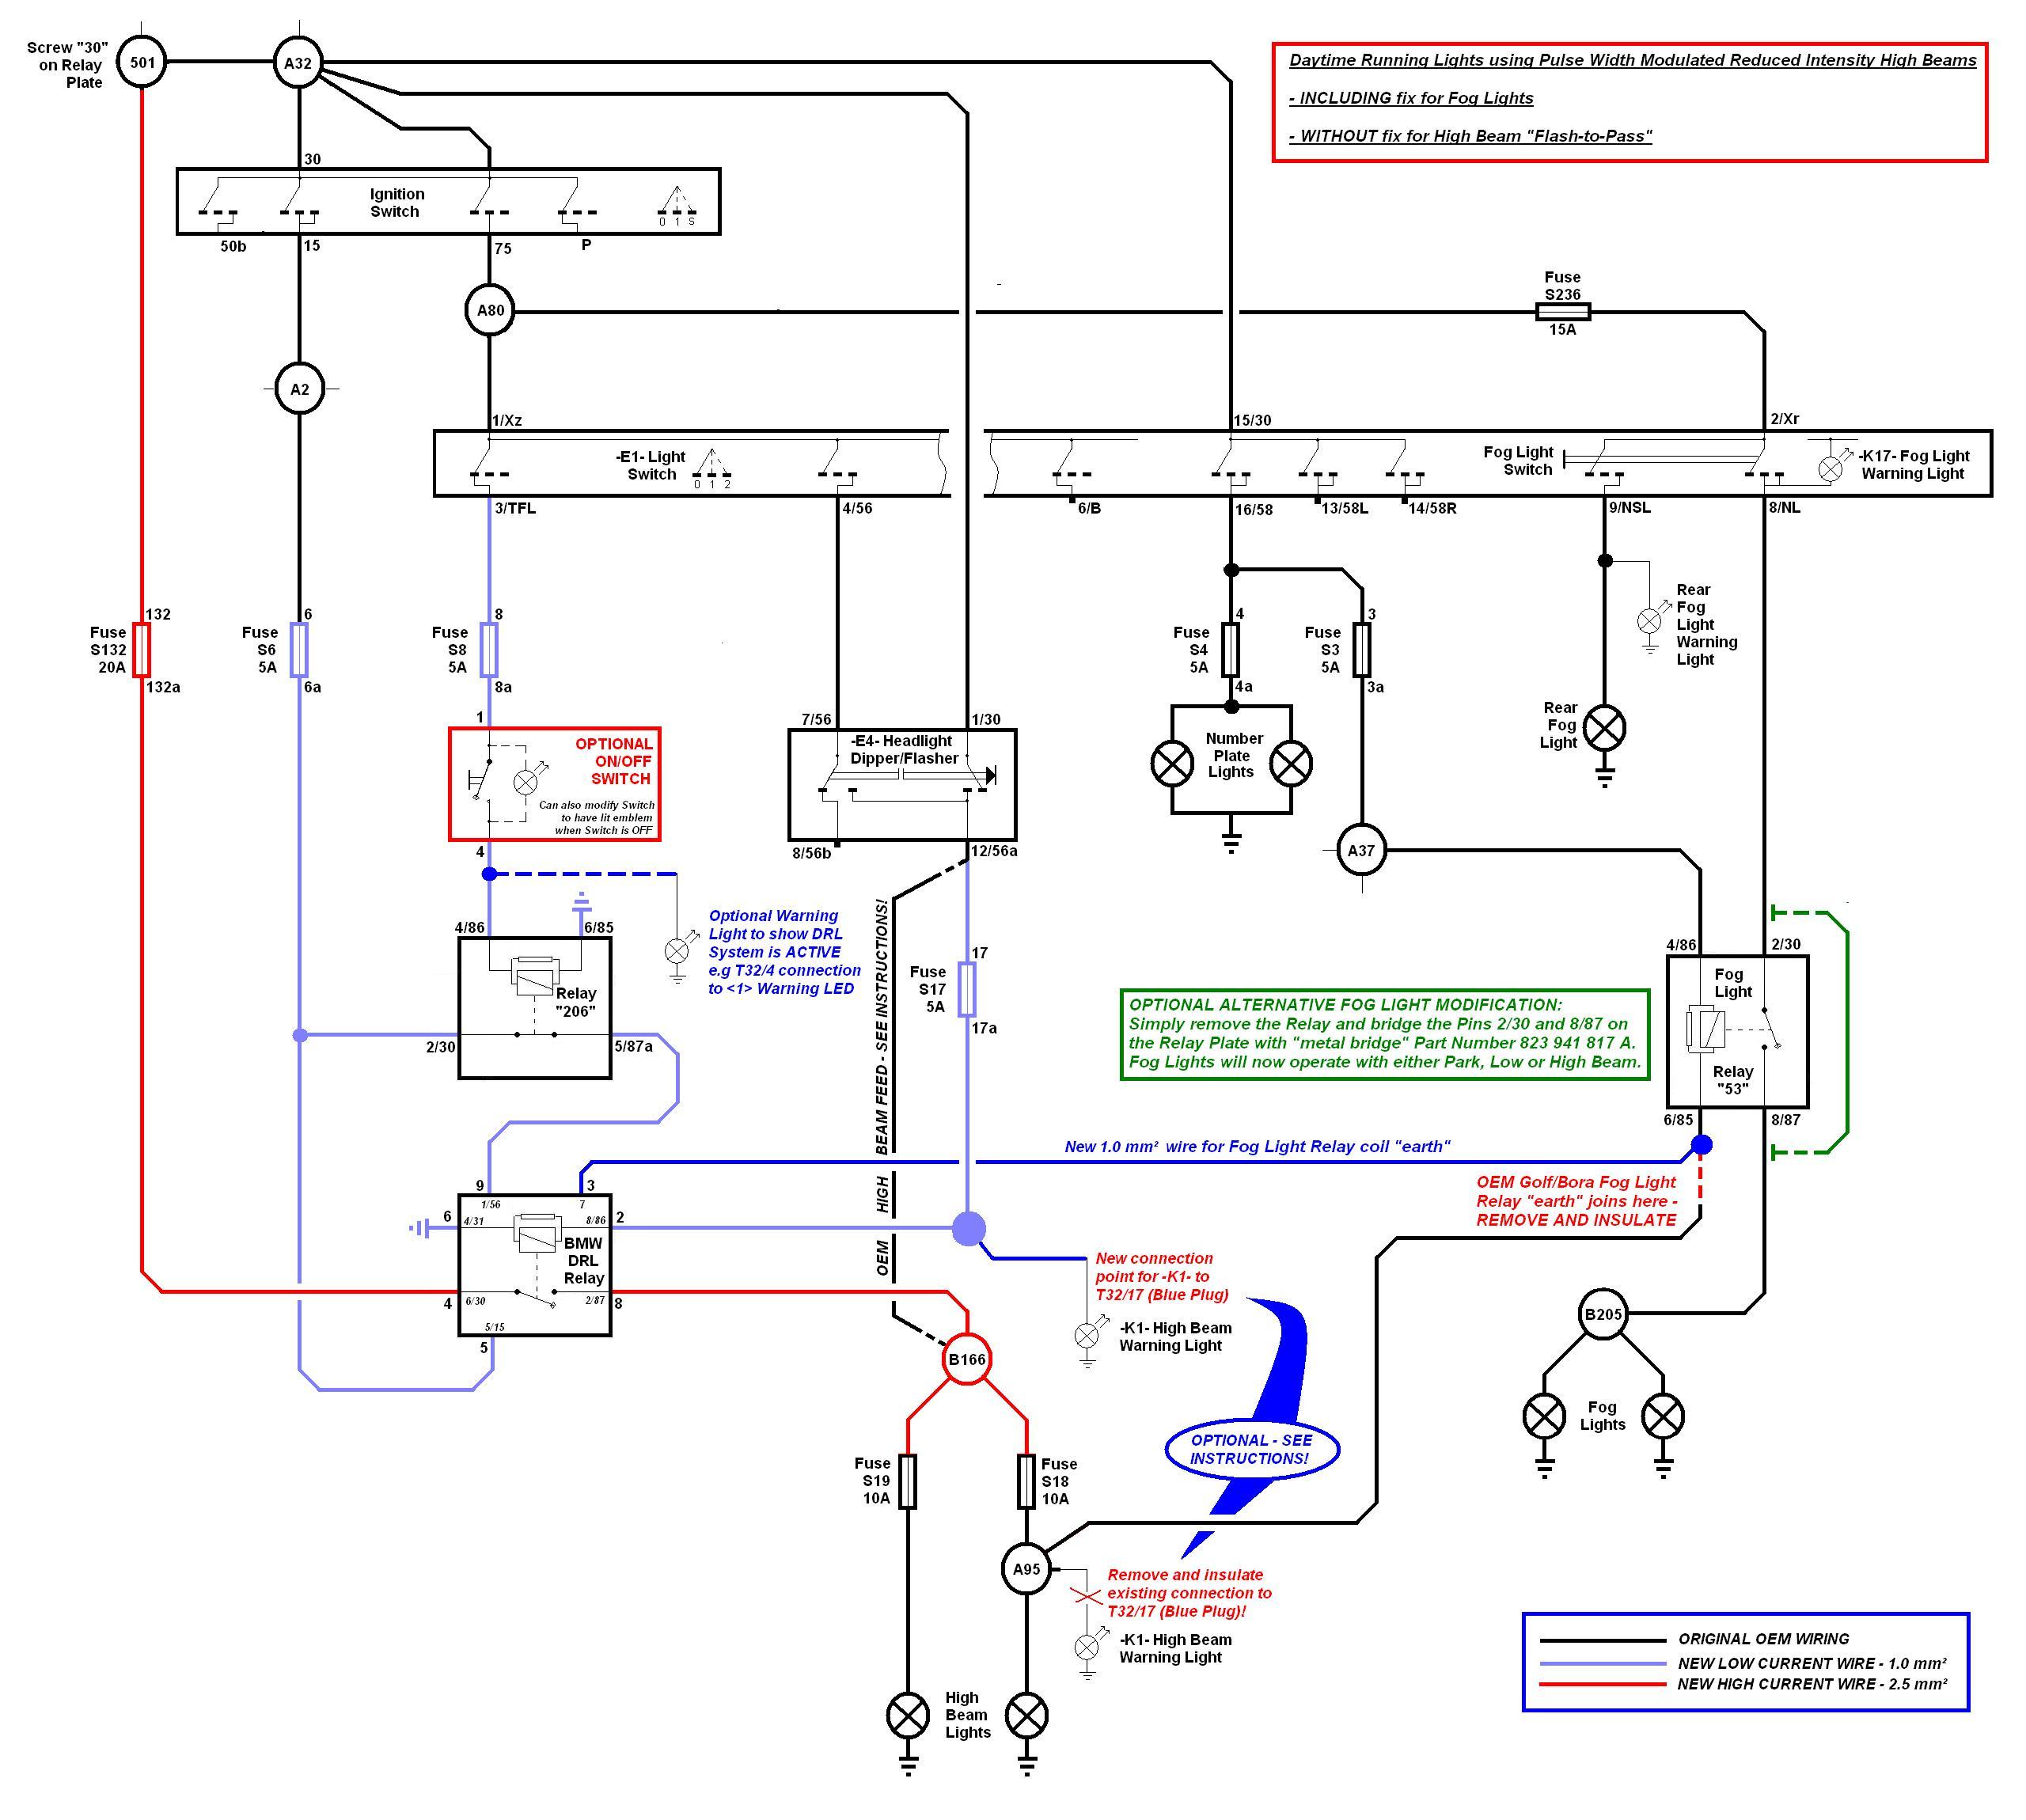 Daytime Running Light Wiring Diagram - Database